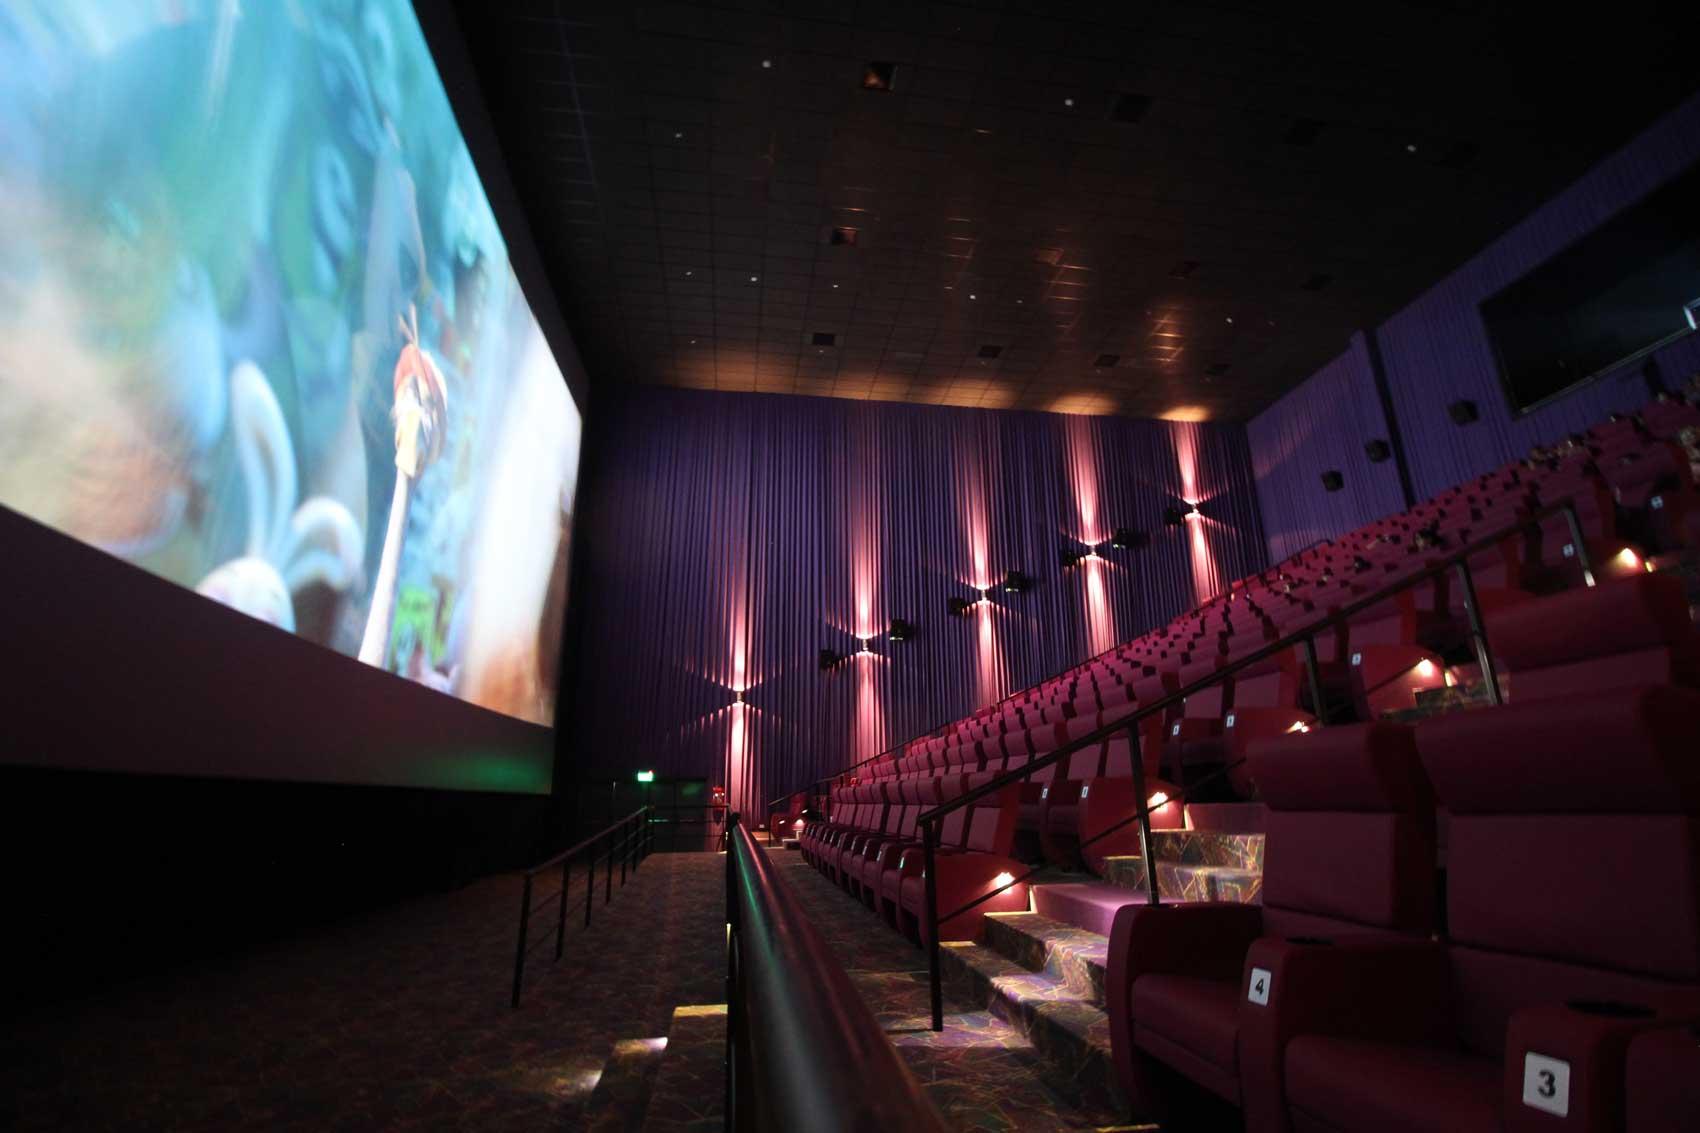 Cine 3d xtremo cines multiplex - Fotos de salas de cine ...